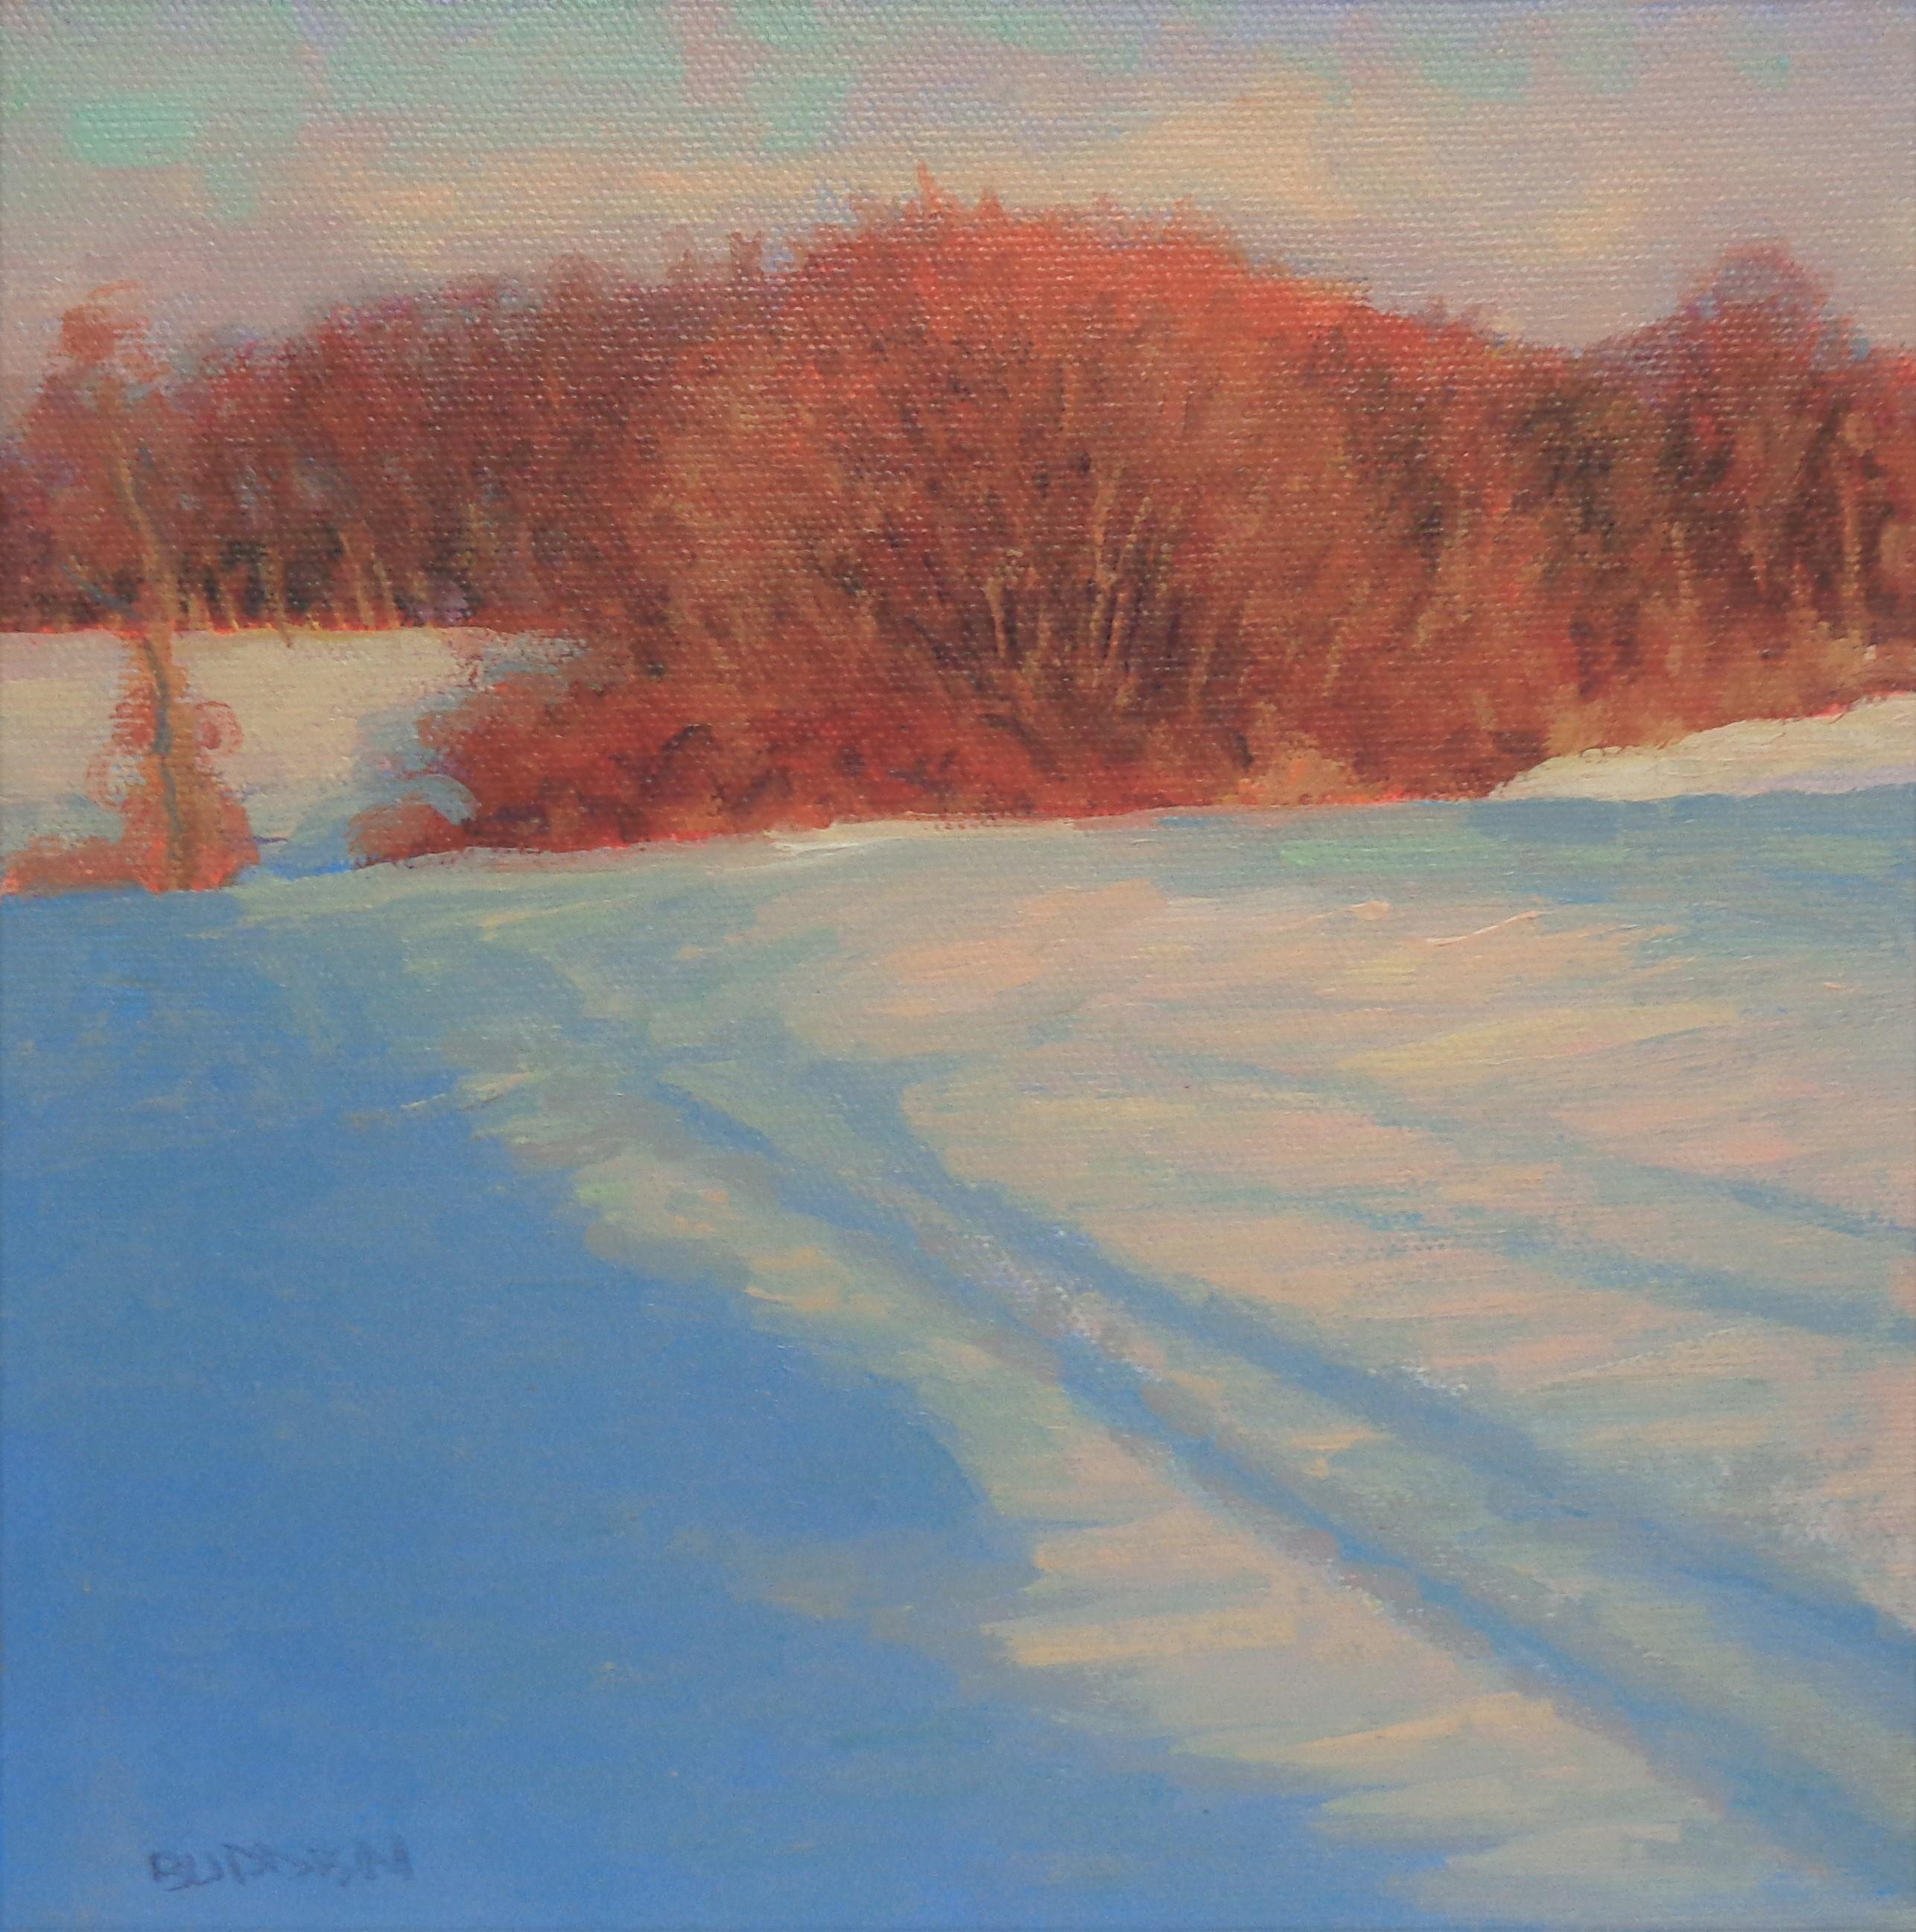 Winter Landscape Oil Painting Michael Budden  Winter Light Snow Shadows